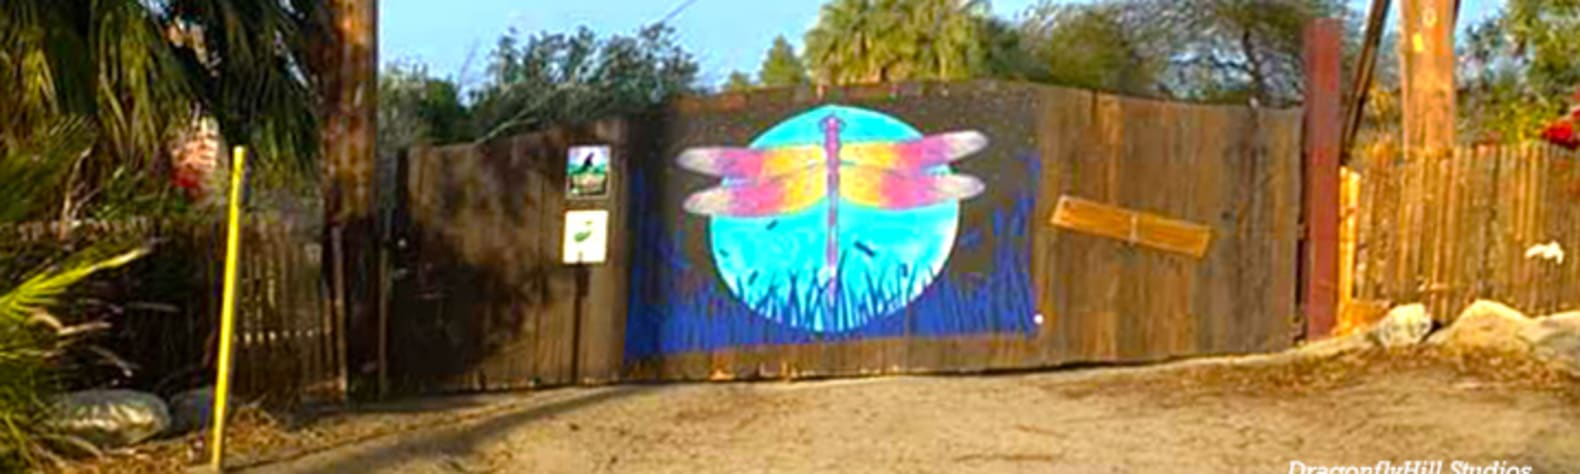 DragonflyHill Desert Farm